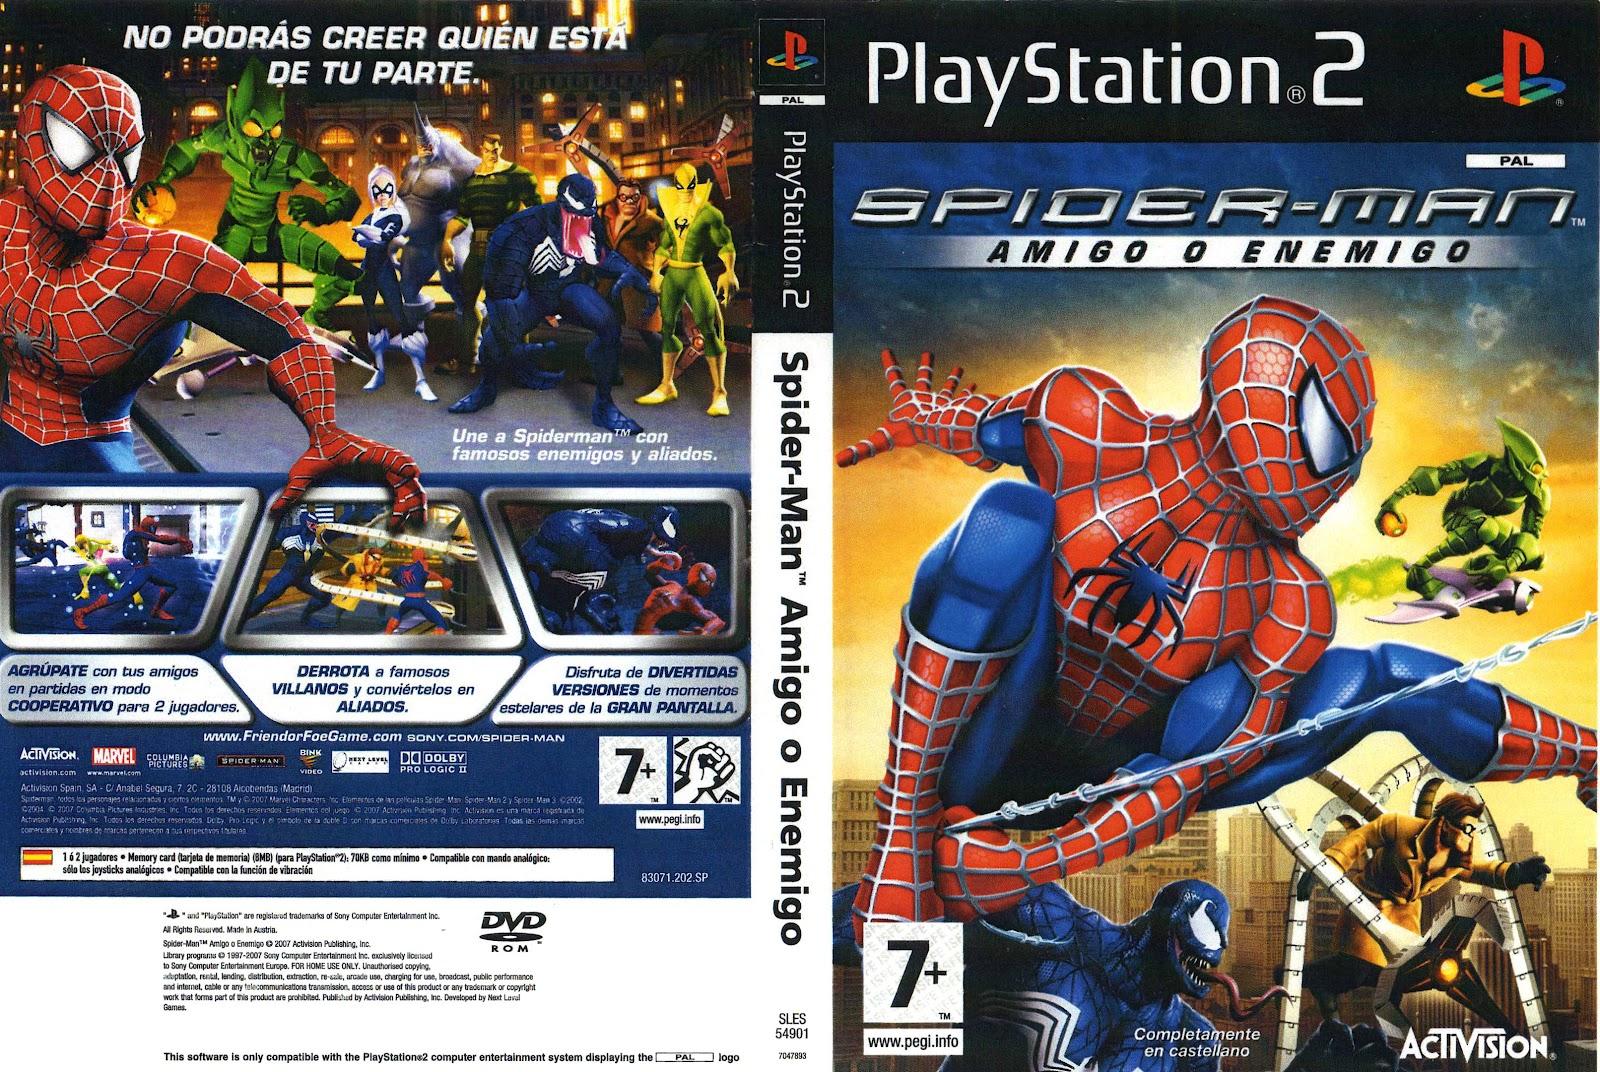 Juegos Play 2 Correopatagonico